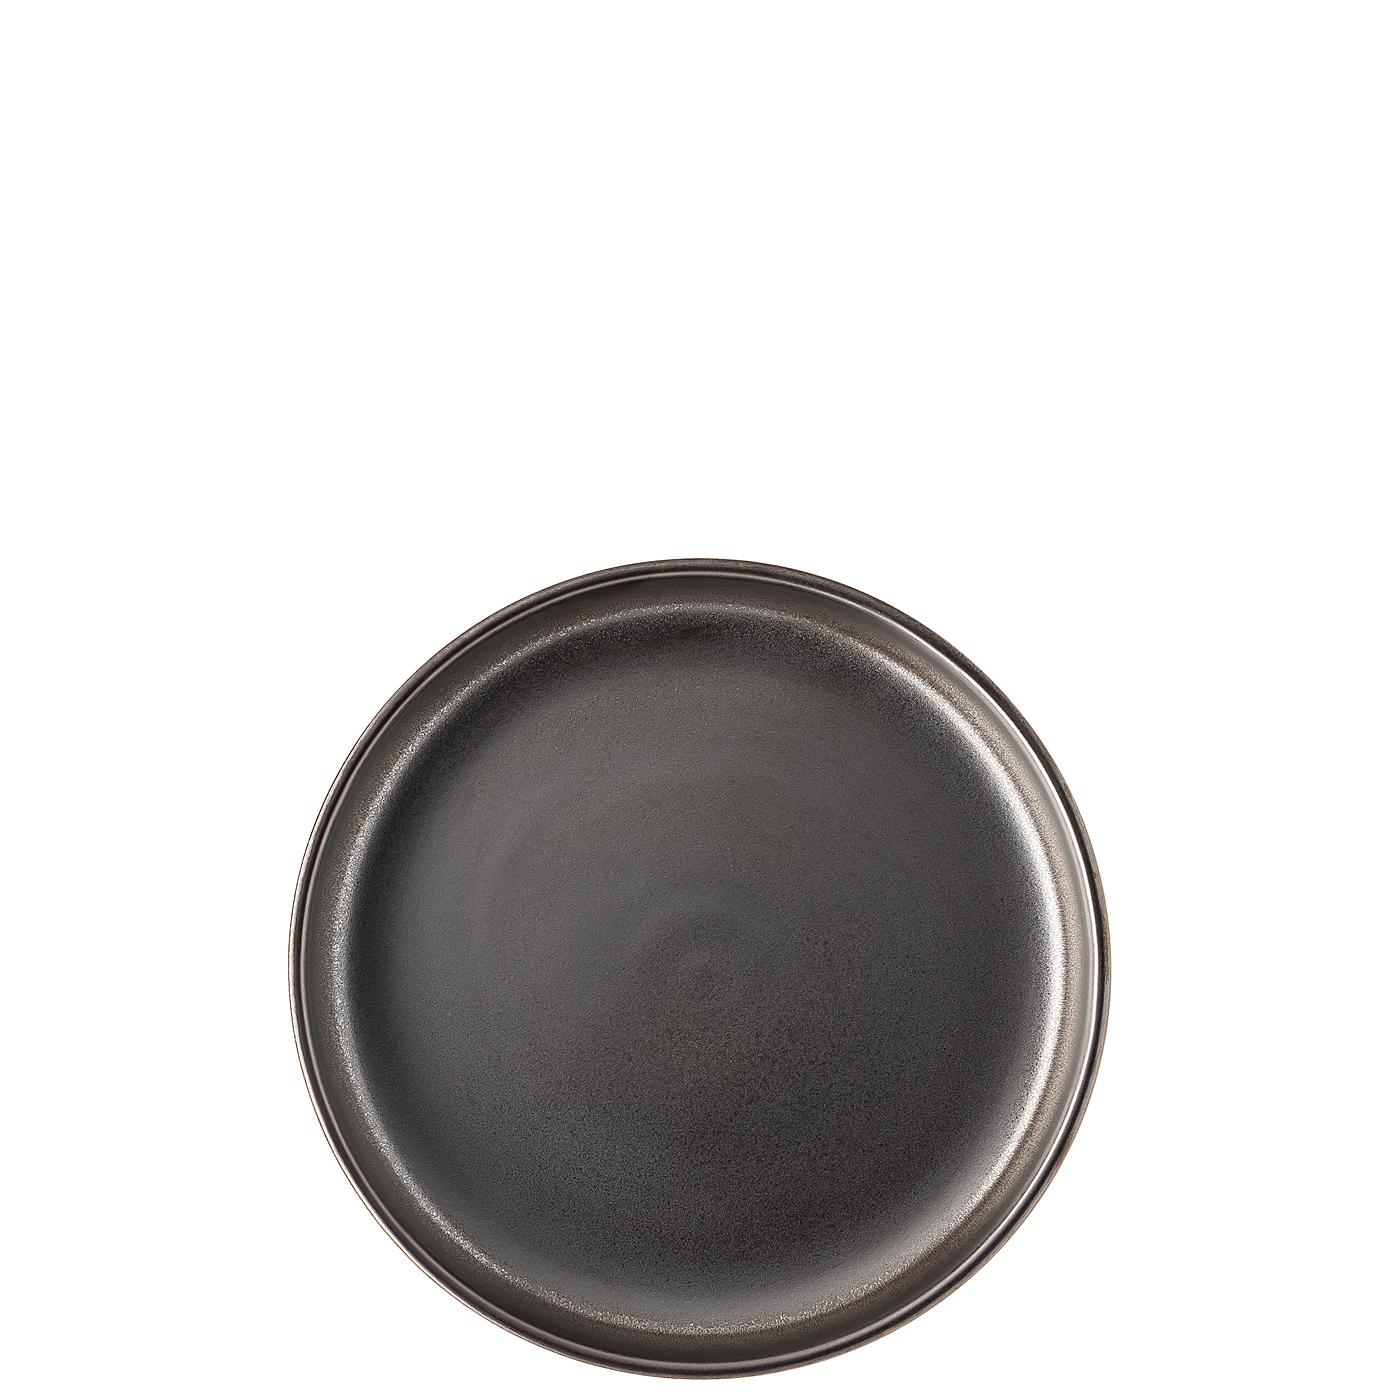 Gourmetteller 20 cm Joyn Stoneware Iron Arzberg